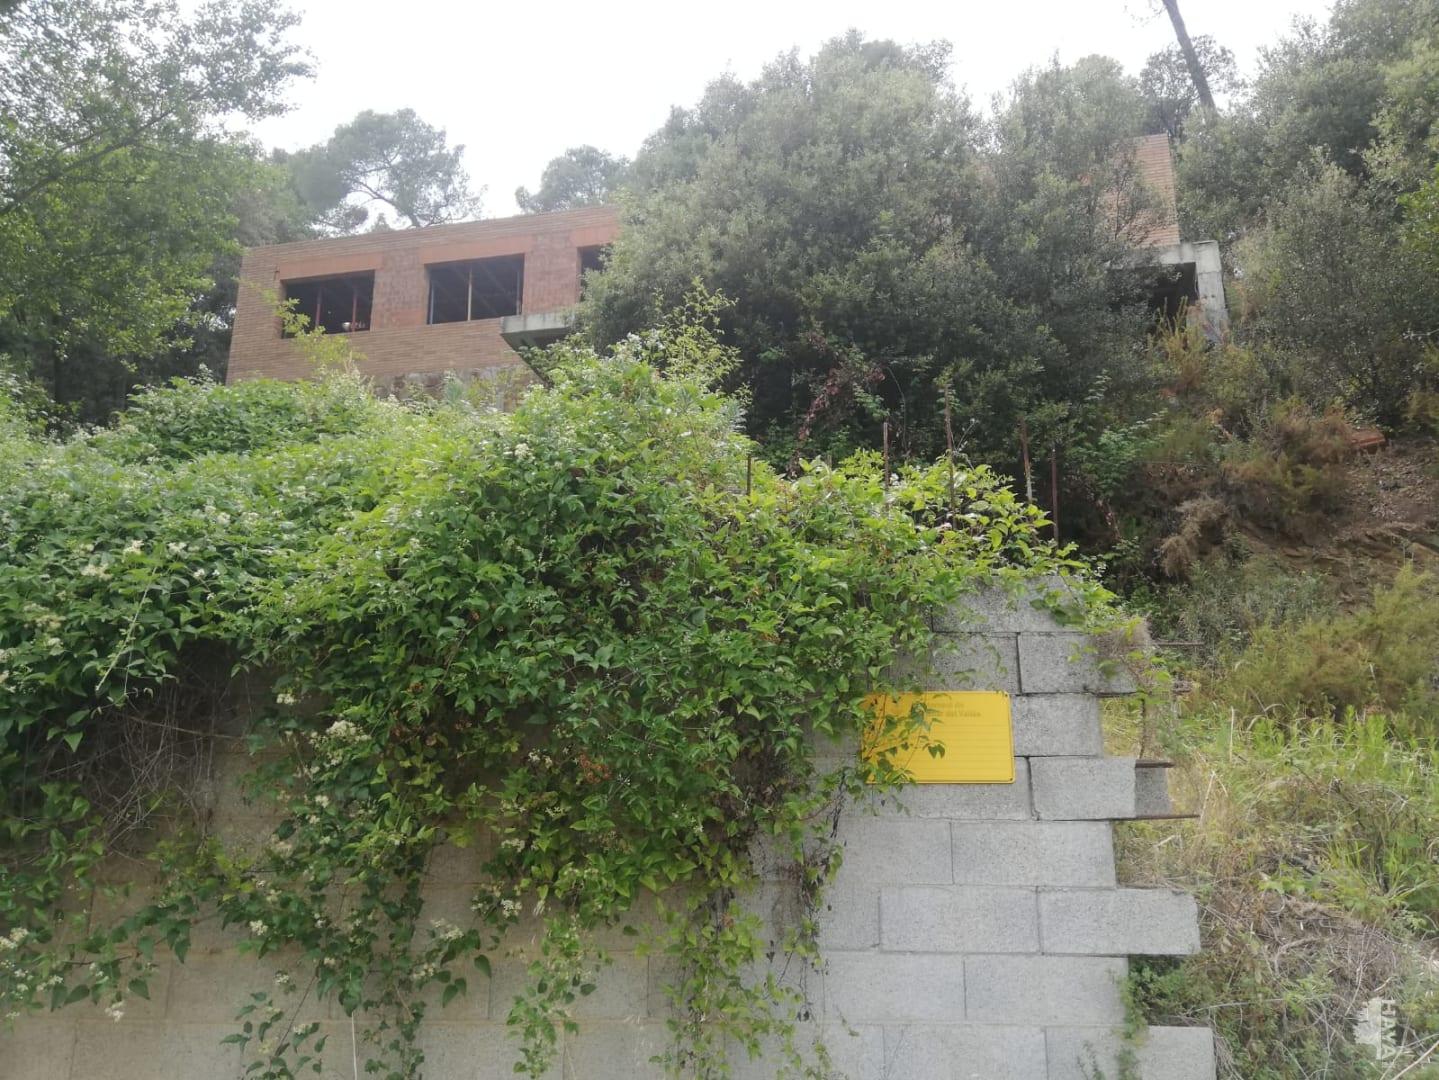 Casa en venta en Sabadell, Barcelona, Calle Joan Balart, 88.731 €, 1 habitación, 1 baño, 257 m2